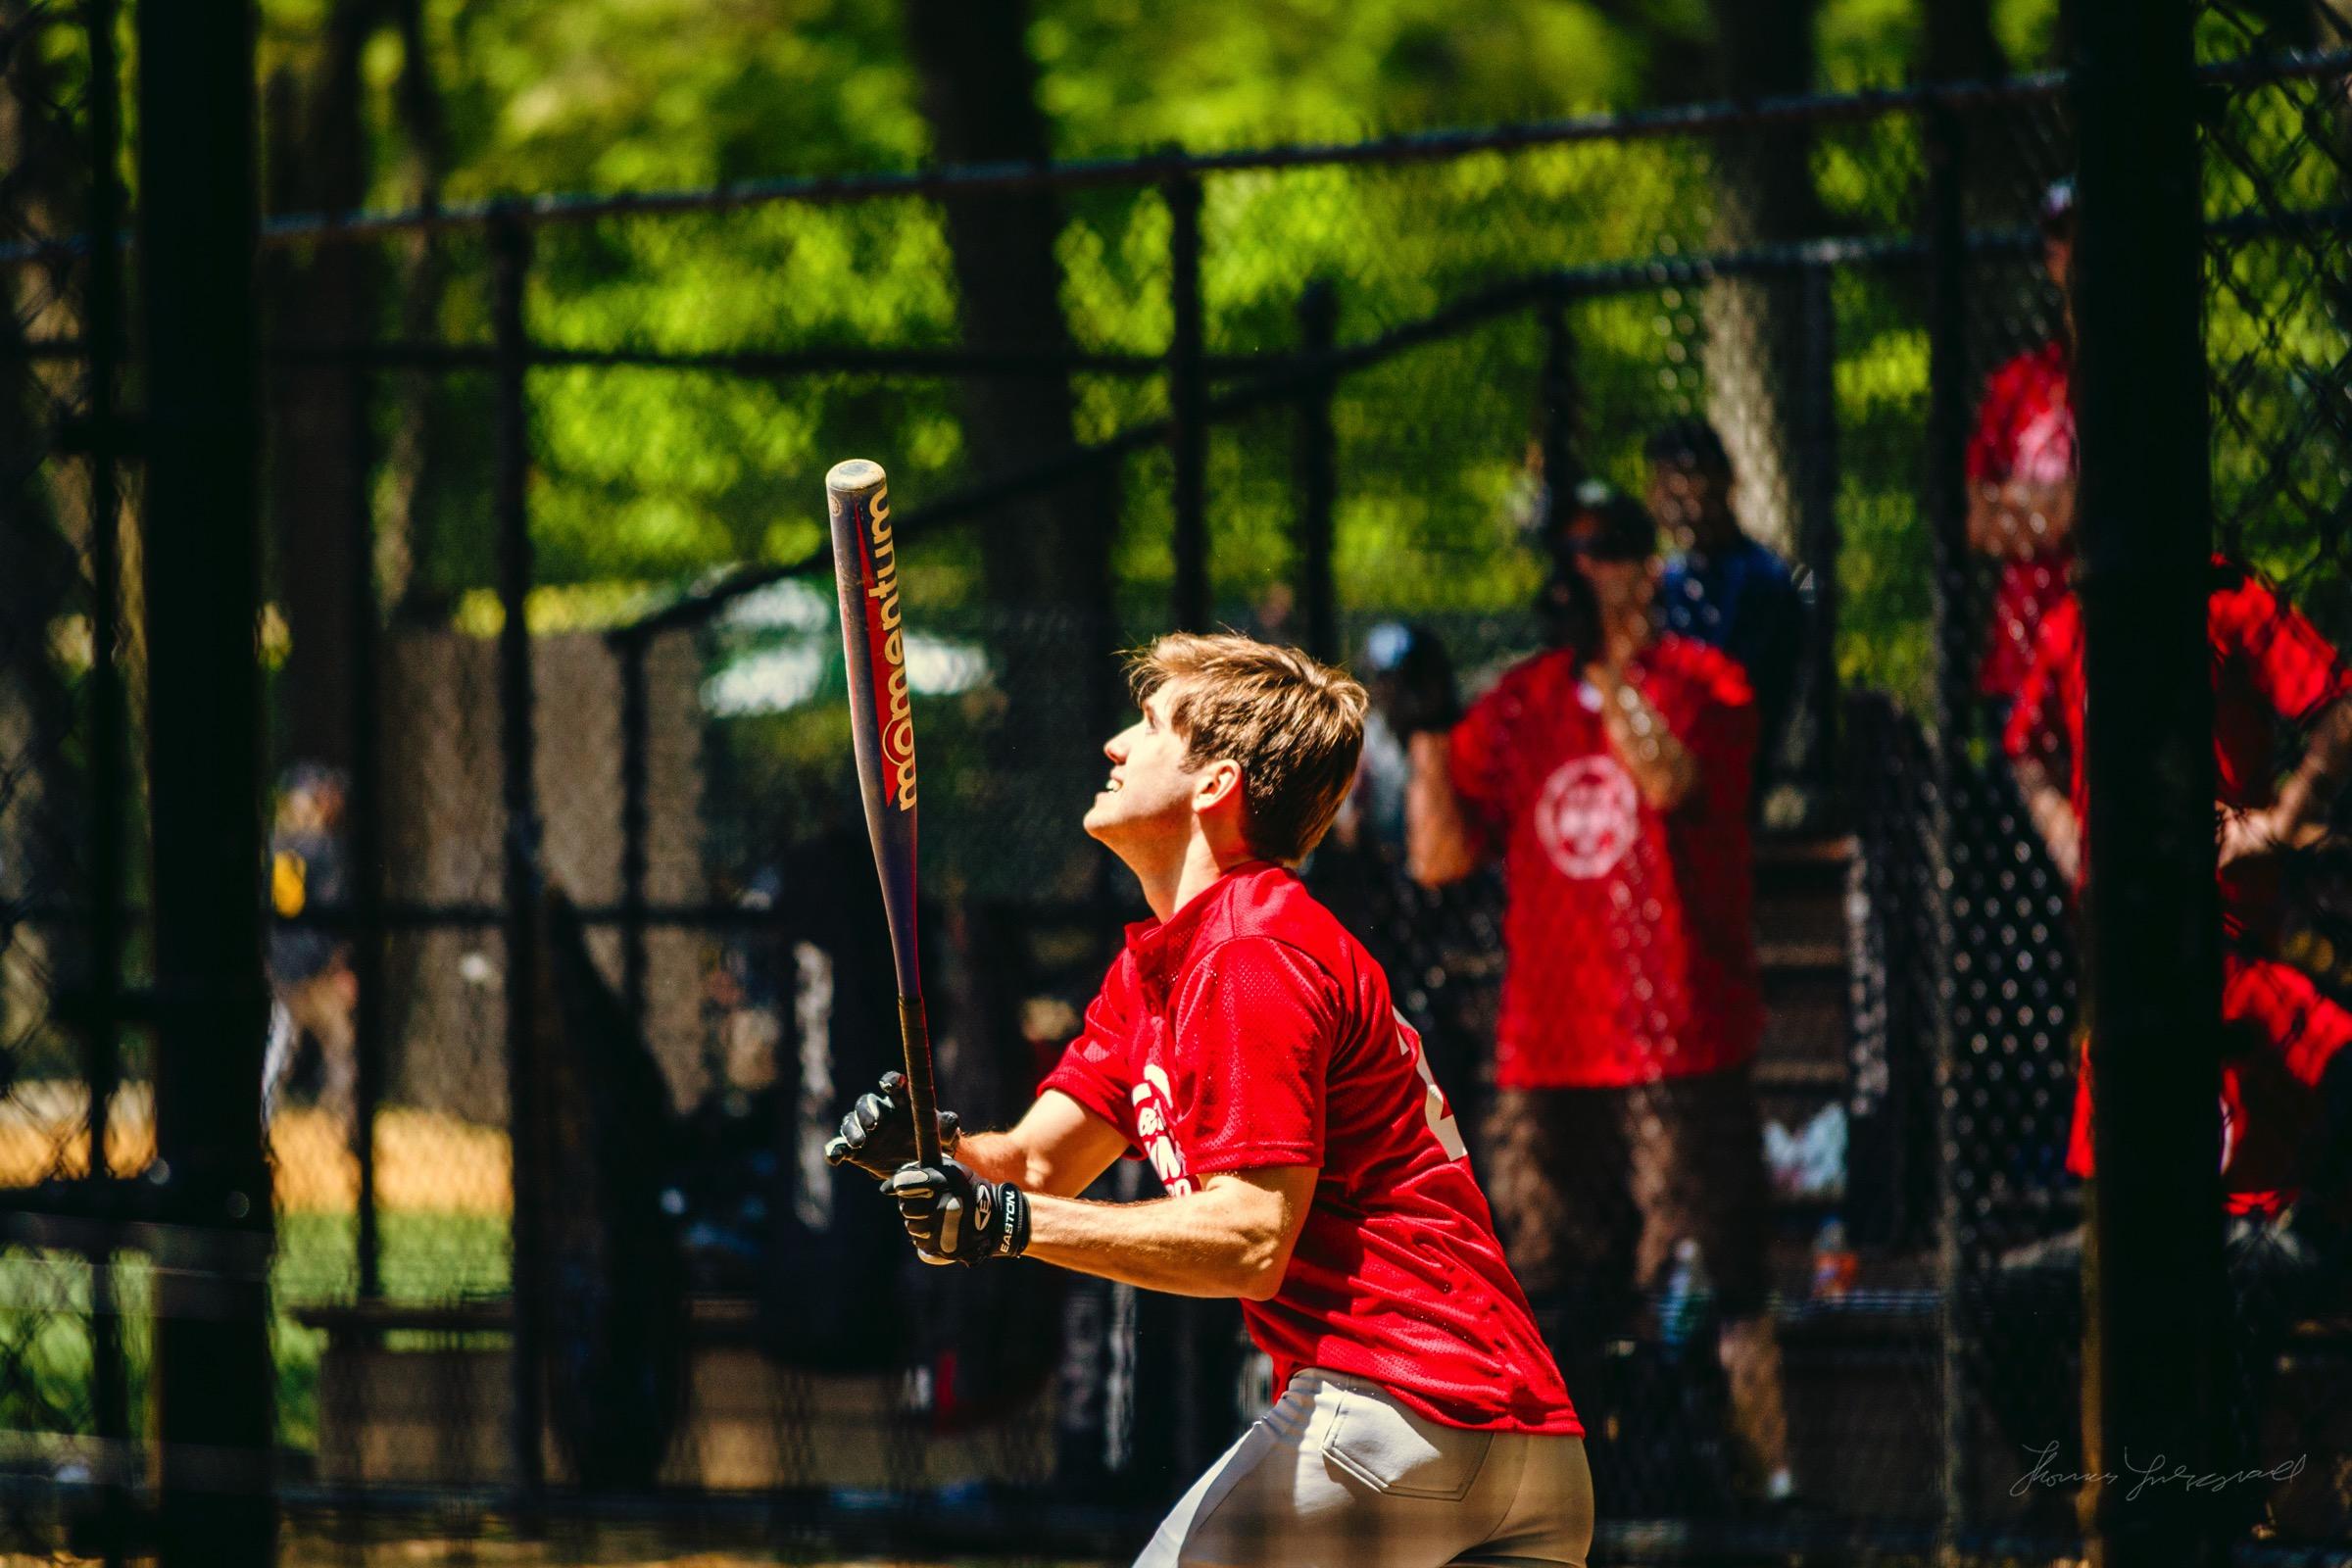 People playing baseball in NewYork City